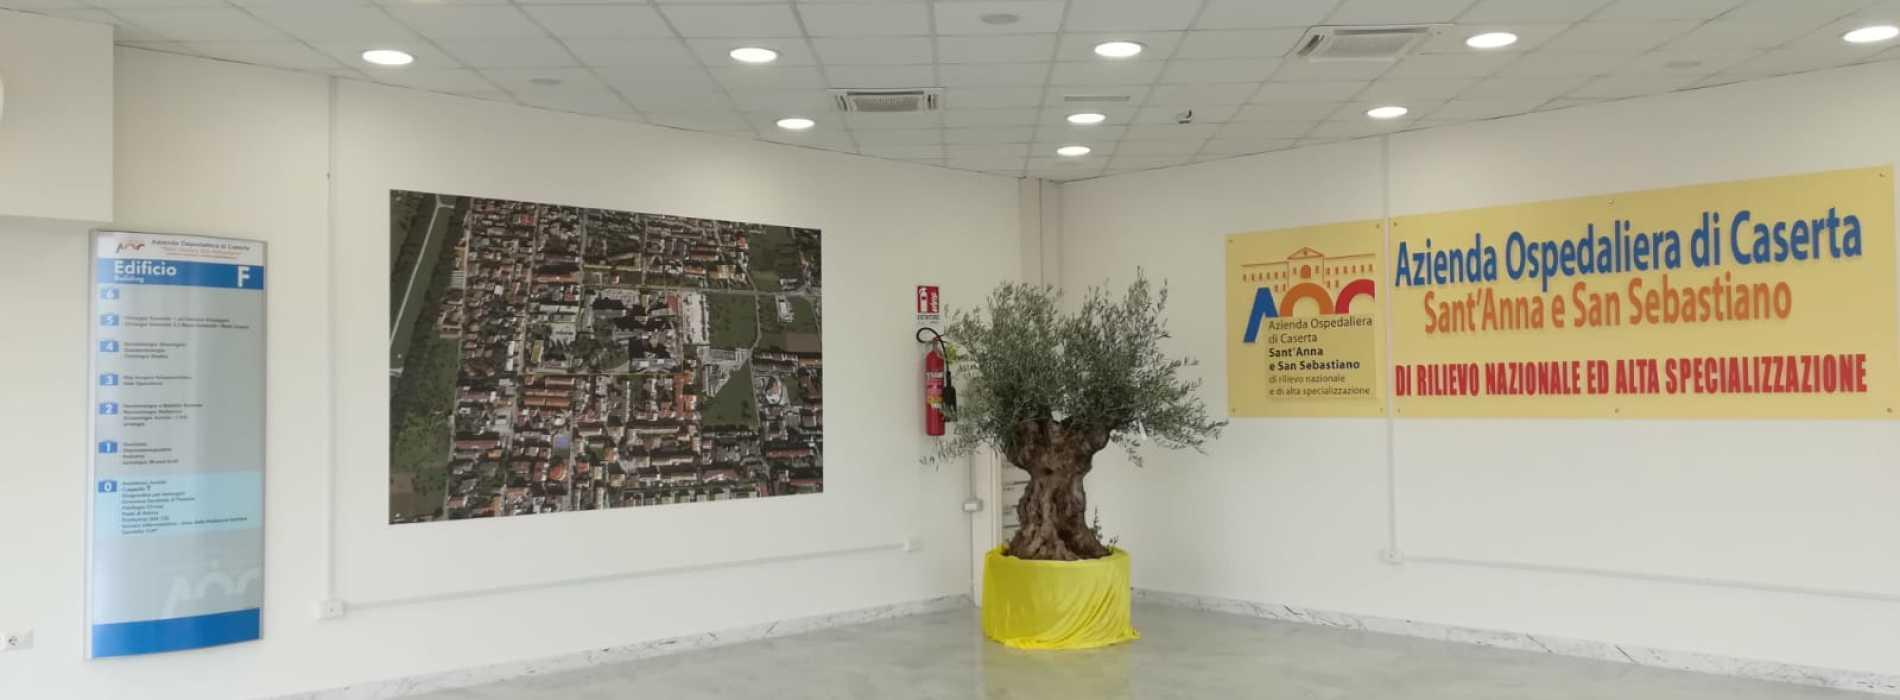 Prevenzione senologica, l'Ospedale di Caserta è in prima linea